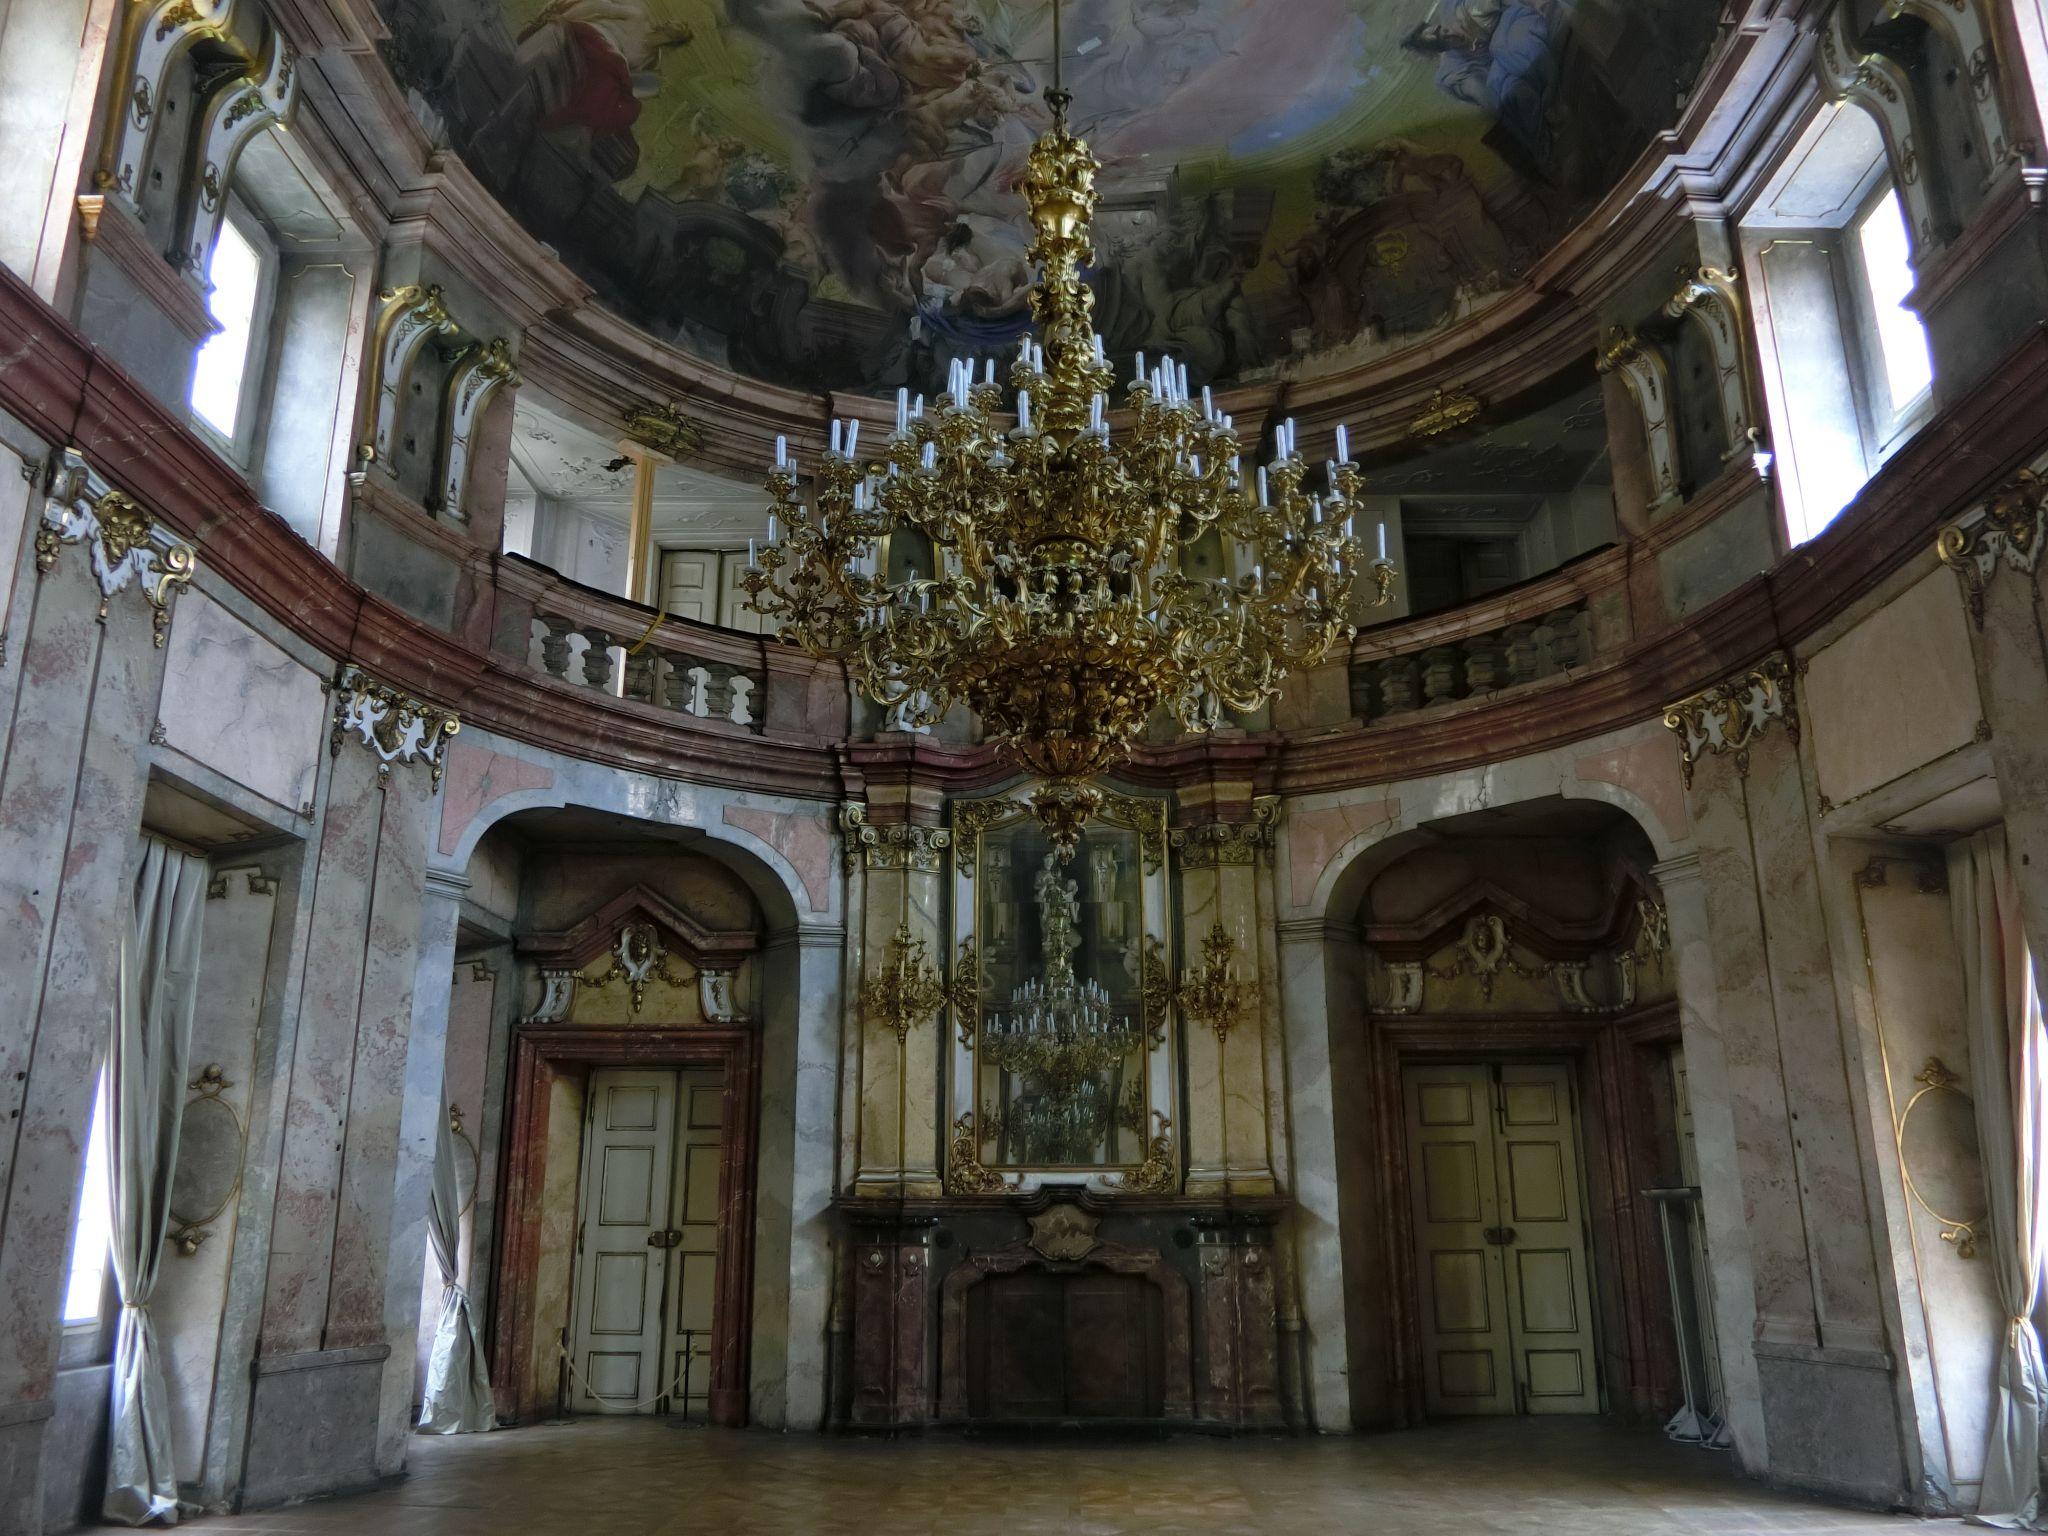 Colloredo-Mansfeld Palace, Czech Republic